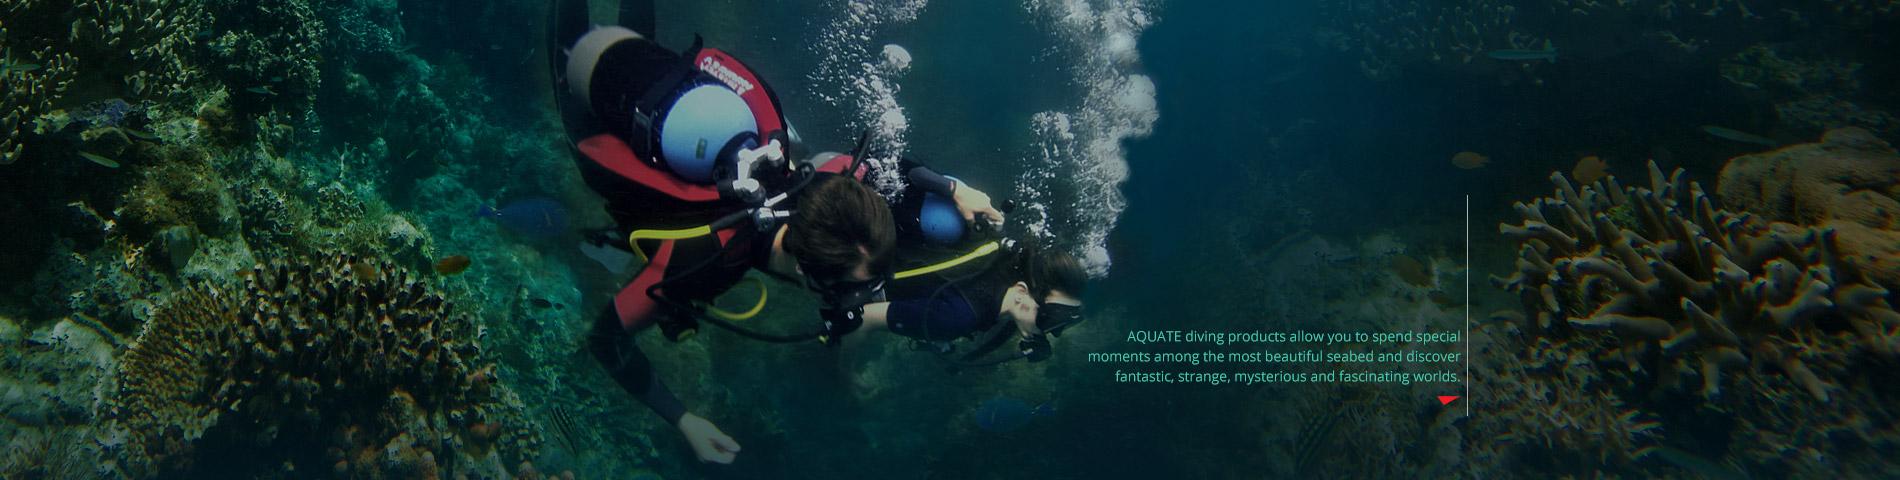 AQUATEC Productos innovadores por Submarinismo (bucear) deporte